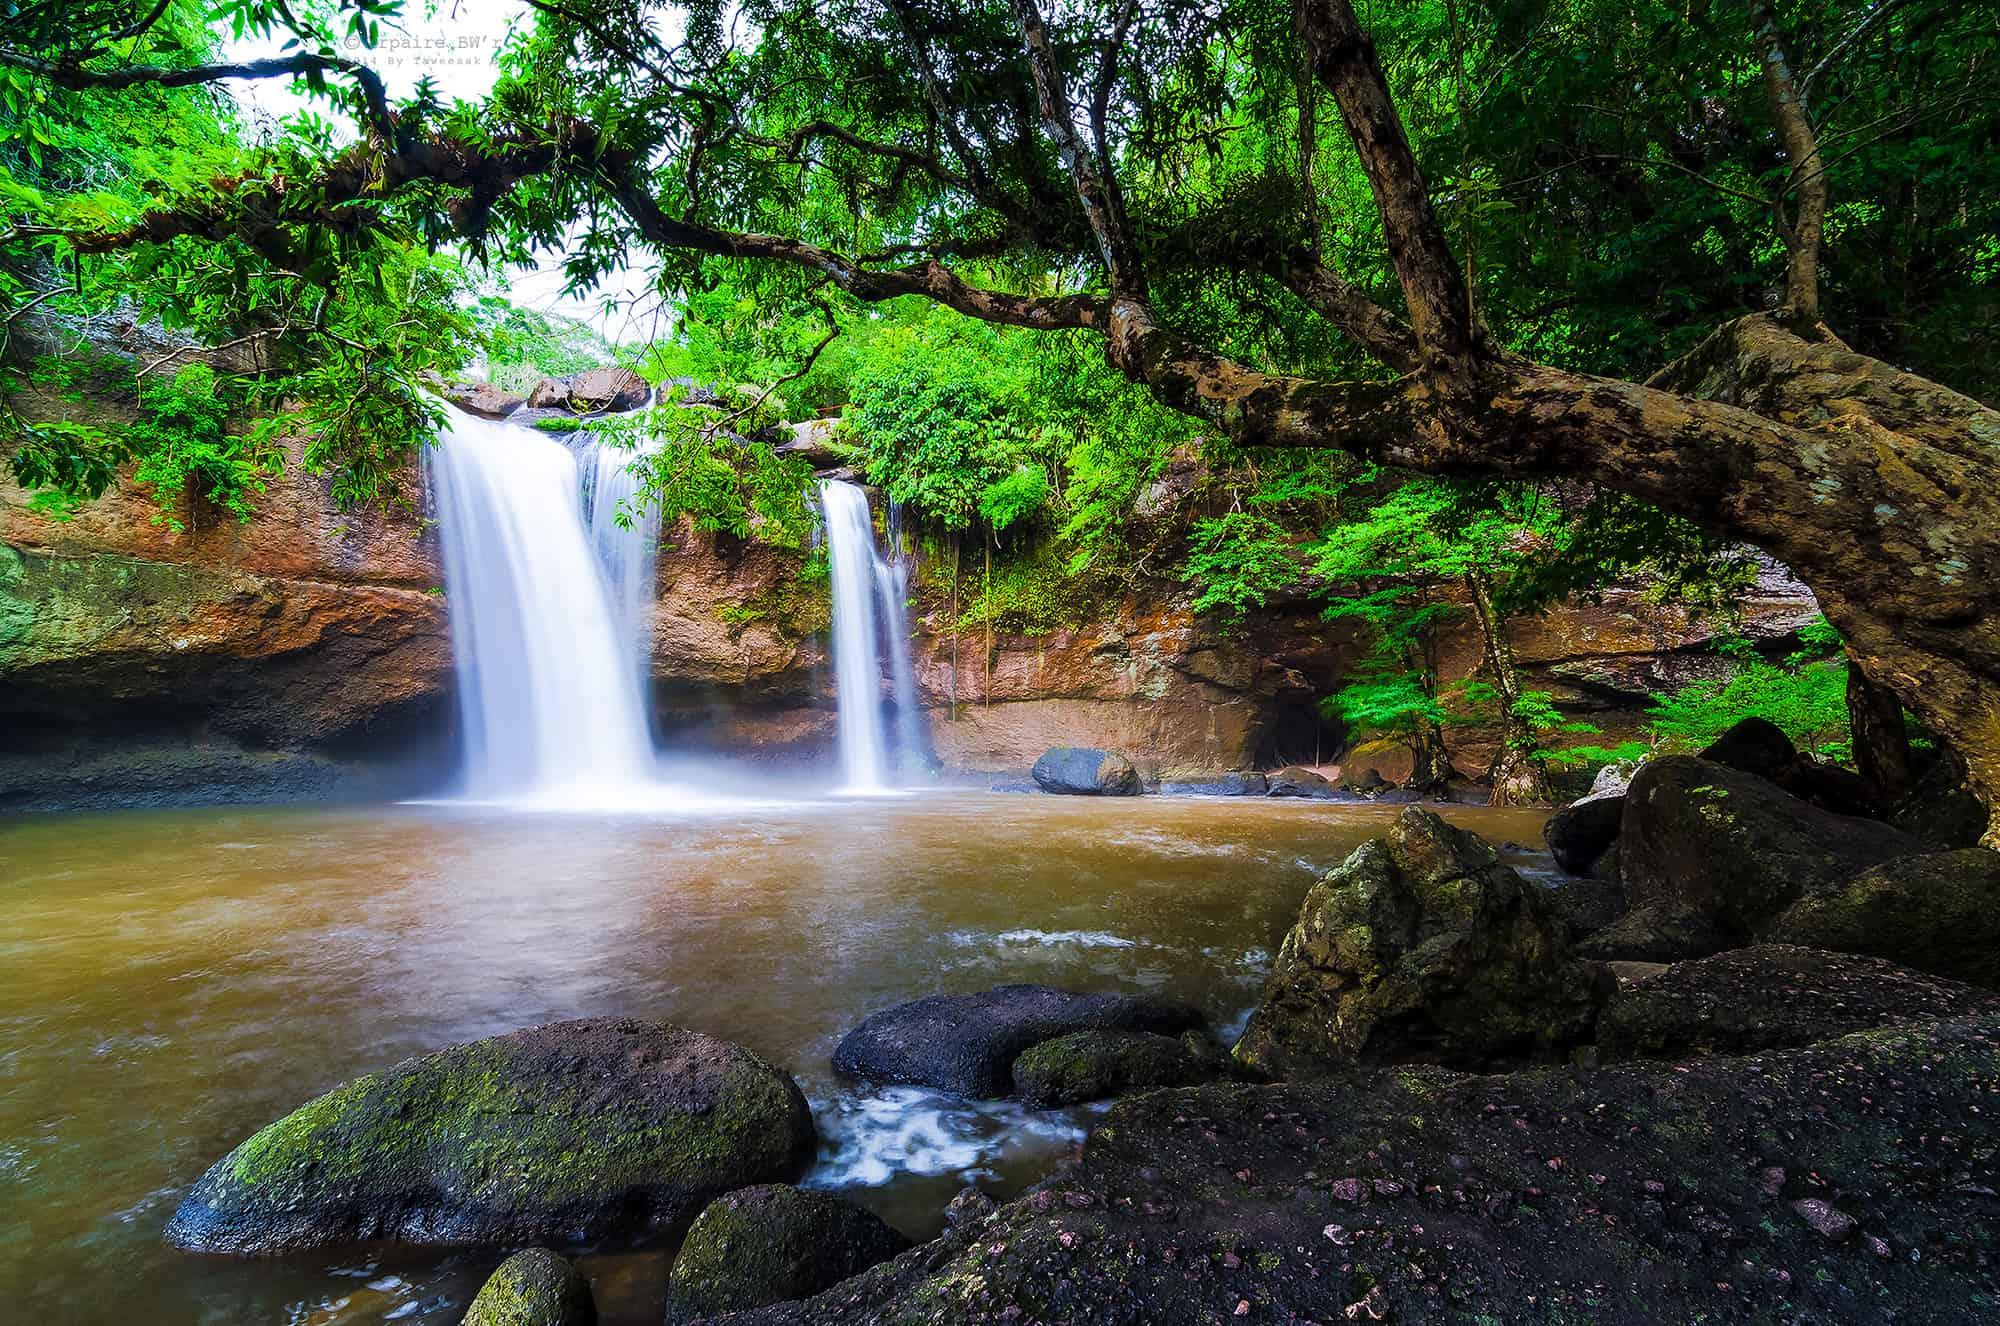 Haew Suwat Waterfall, Khao Yai National Park, Nakhon Ratchasima, Thailand